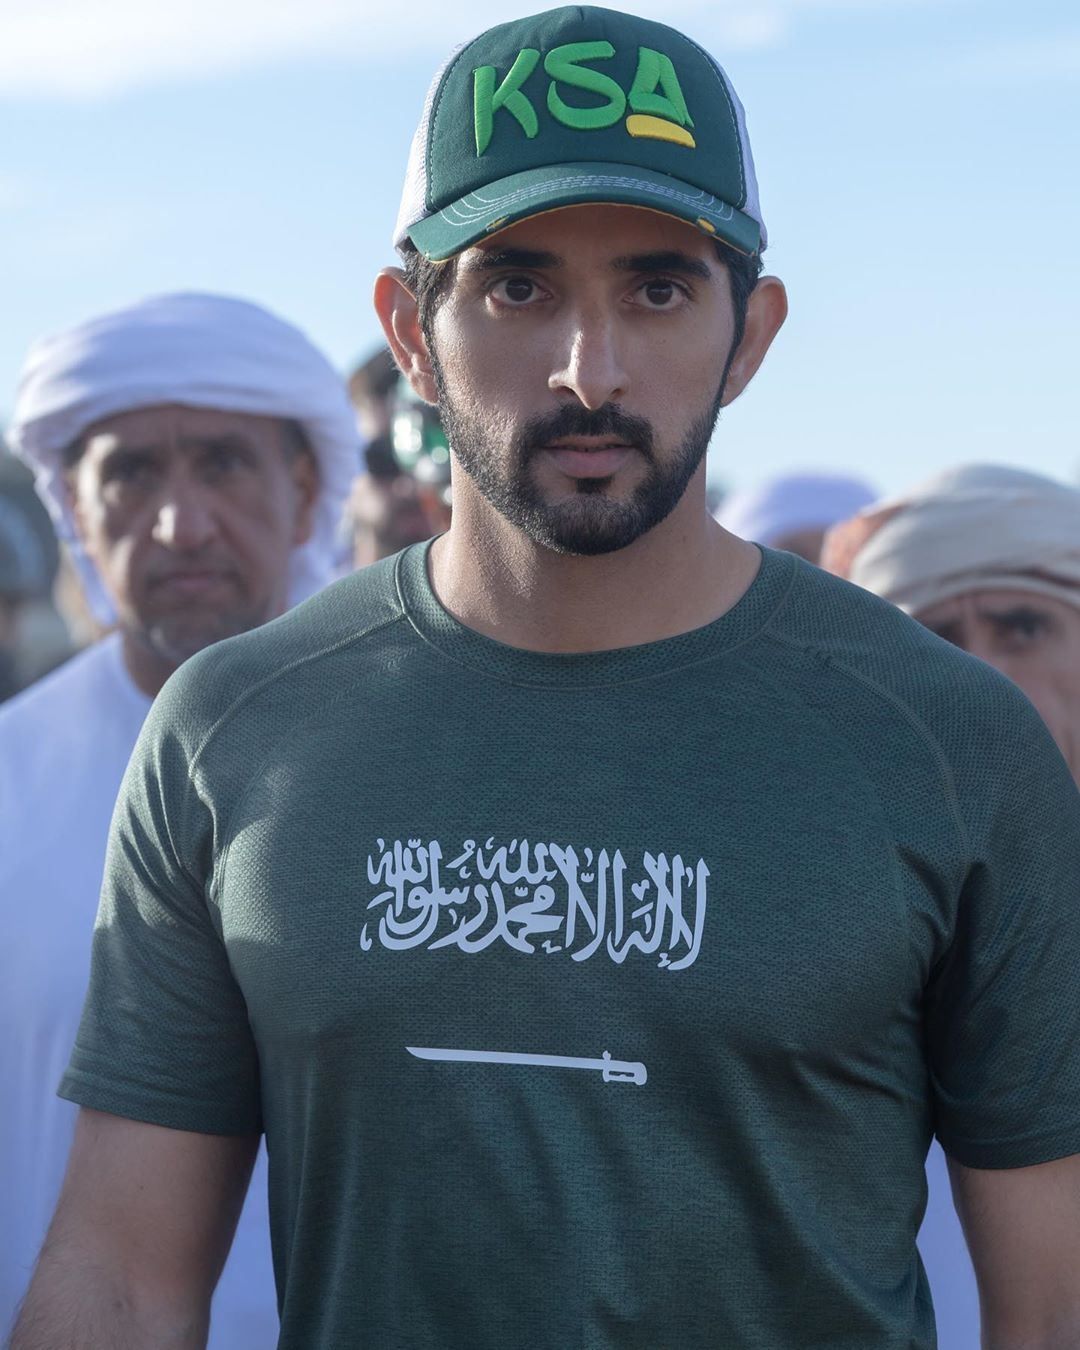 Sheikh Hamdan Wife Photos : sheikh, hamdan, photos, Study, Sheikh, Hamdan, Fashion, Trendsetter, Influencer, Esquire, Middle